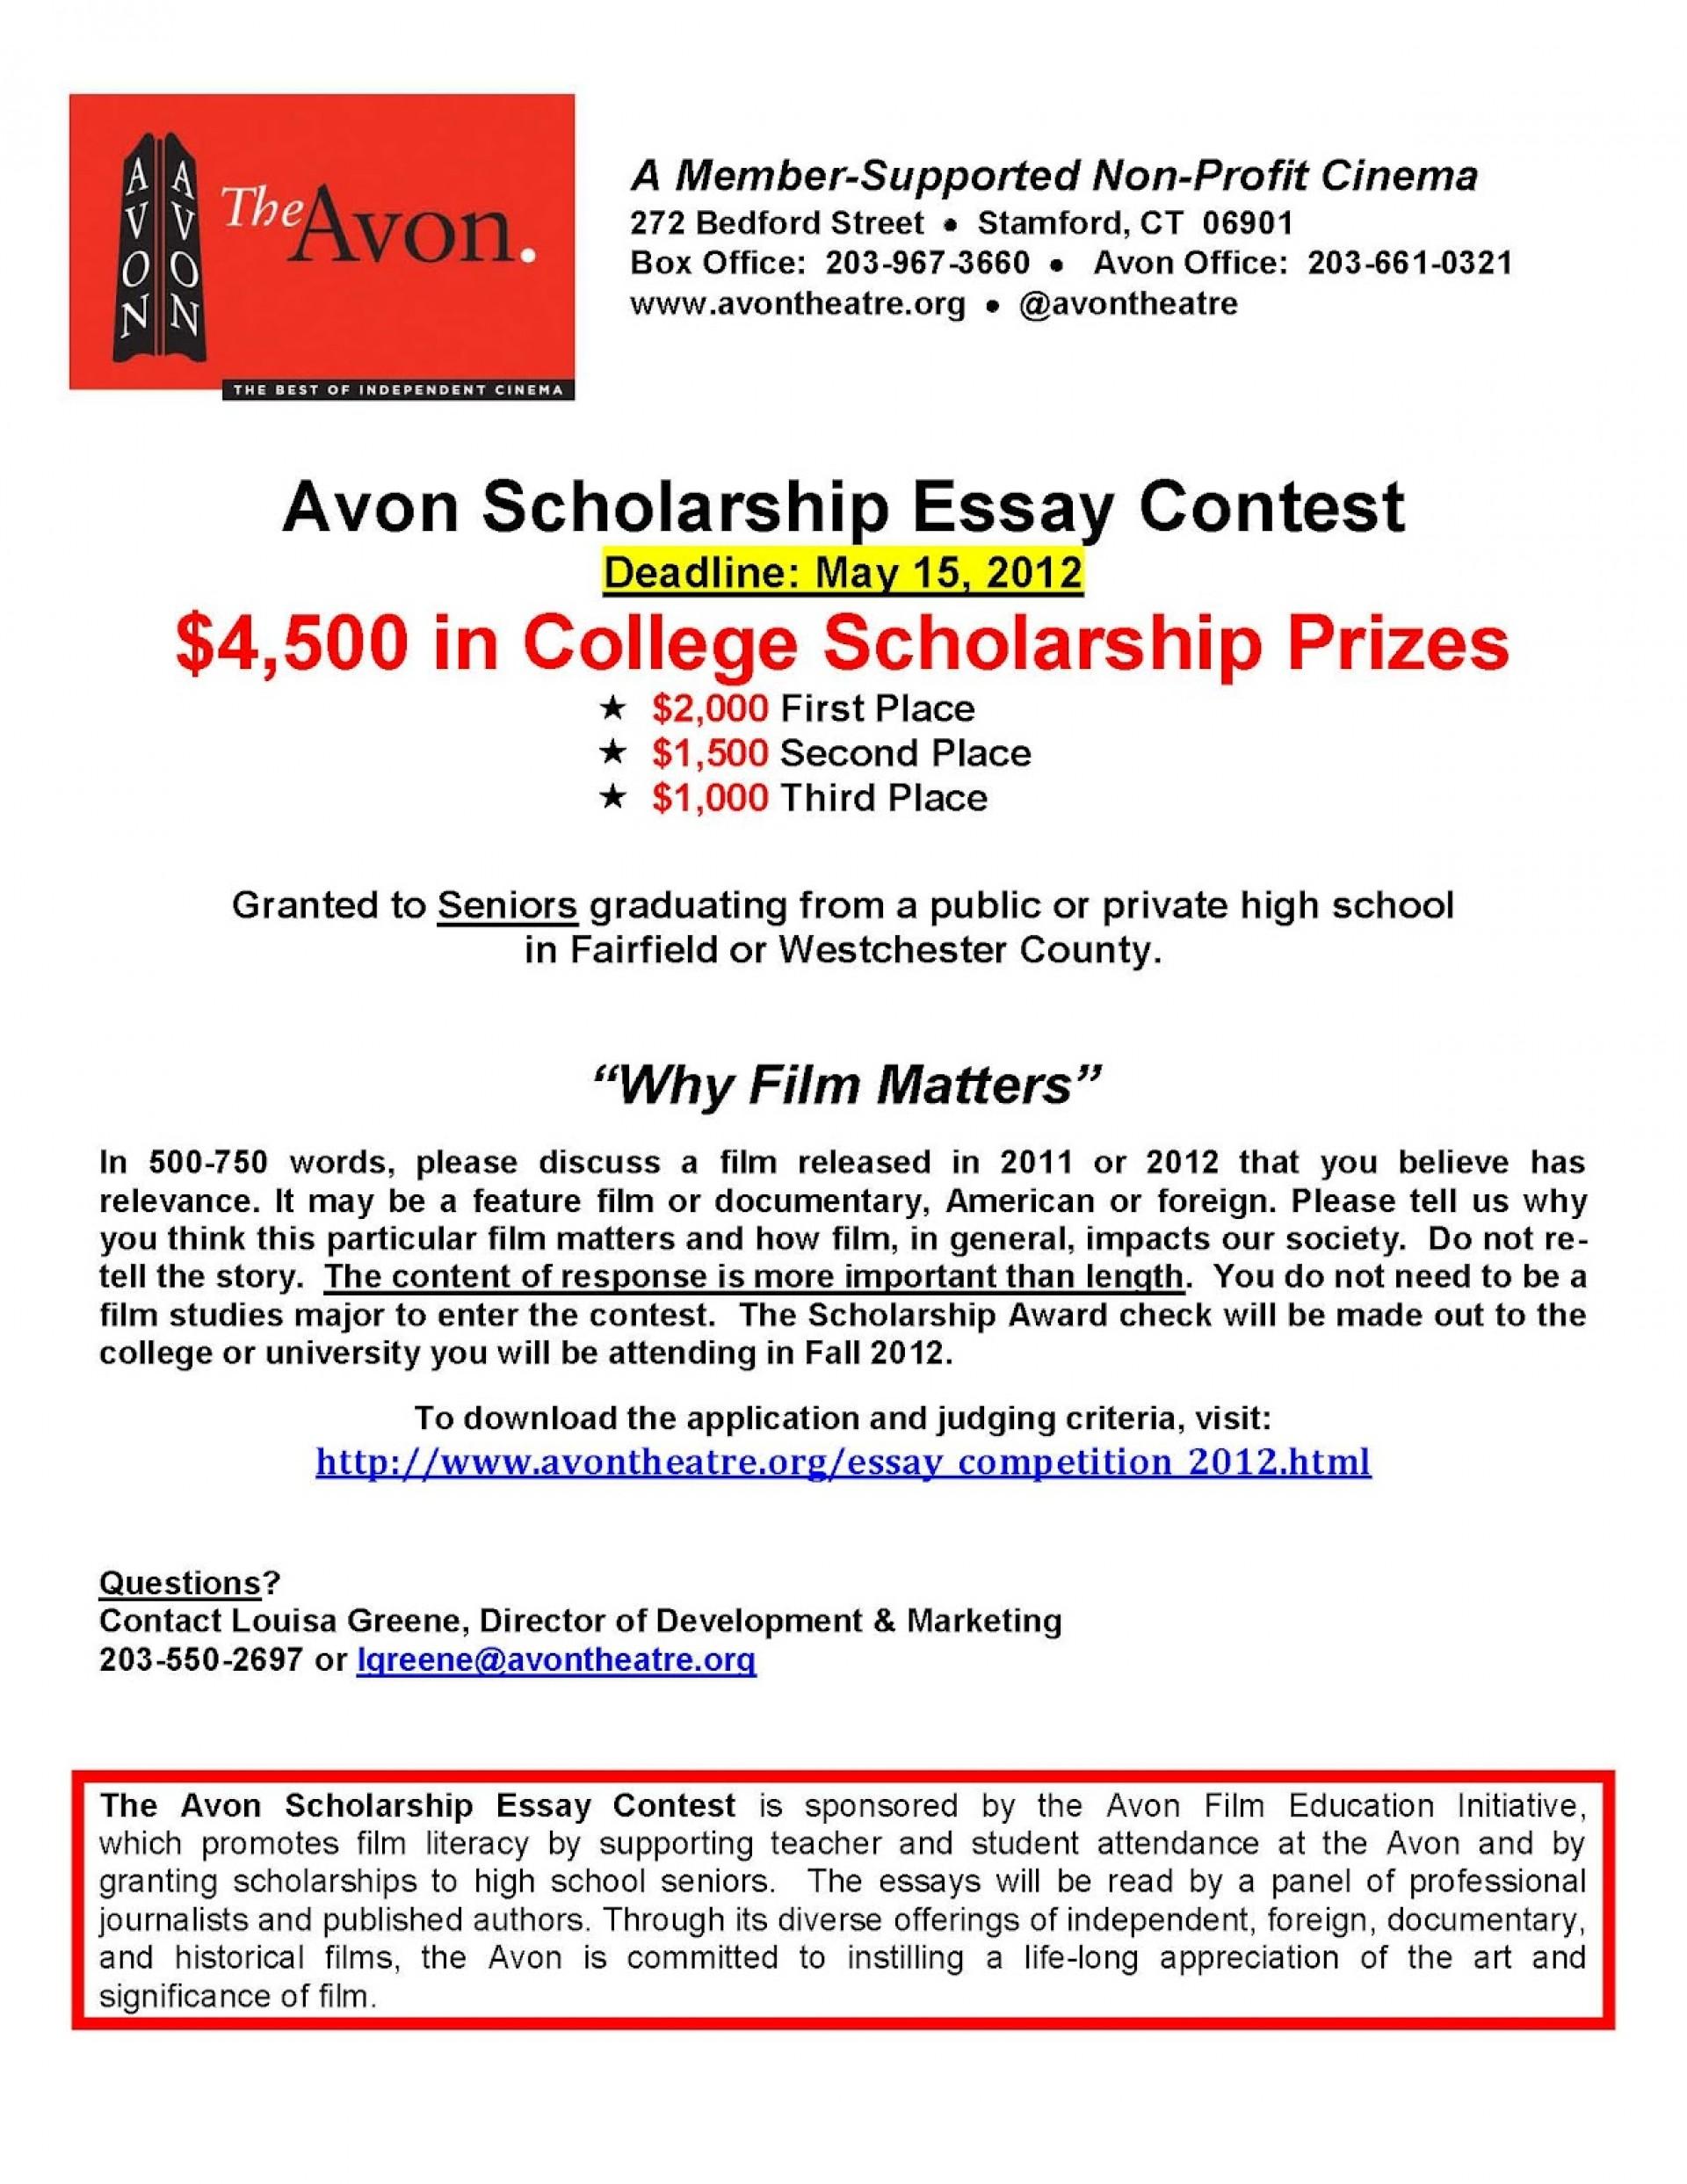 015 No Essay Scholarships Why Apply For Scholarship High School Juniors Avonscholarshipessaycontest2012 Contests Singular 2016 1920